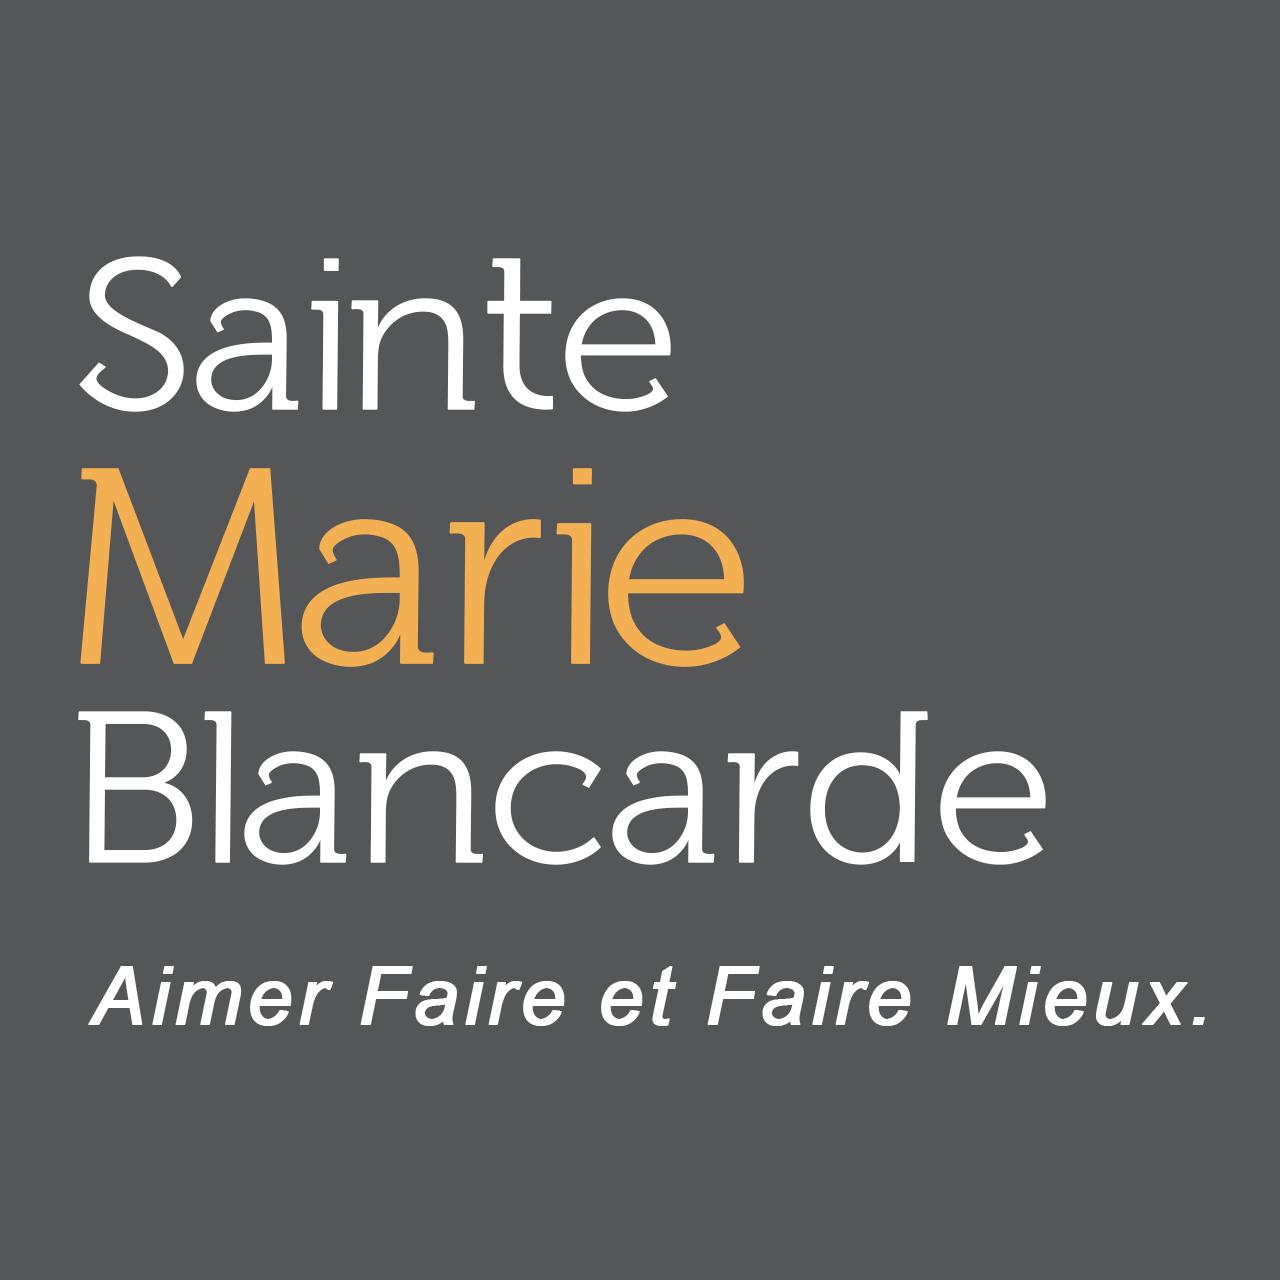 Sainte Marie Blancarde